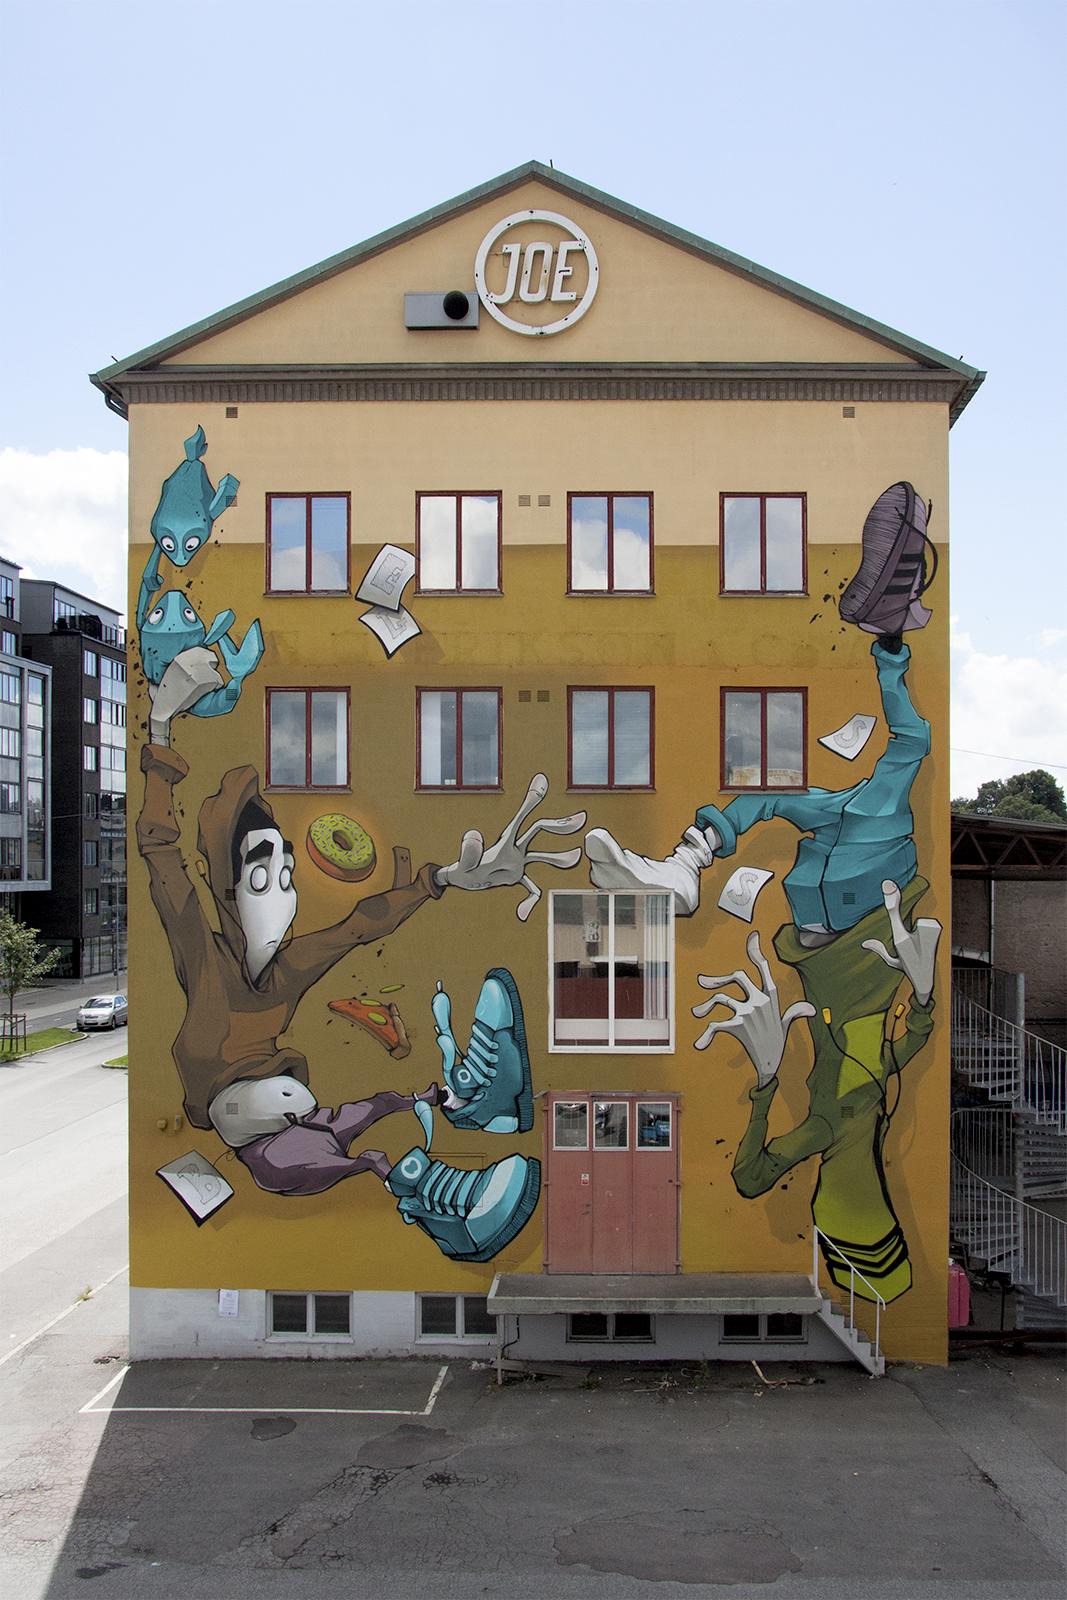 BLESS_Artscape_2016-07-28_FredrikÅkerberg_1067x1600_33.jpg